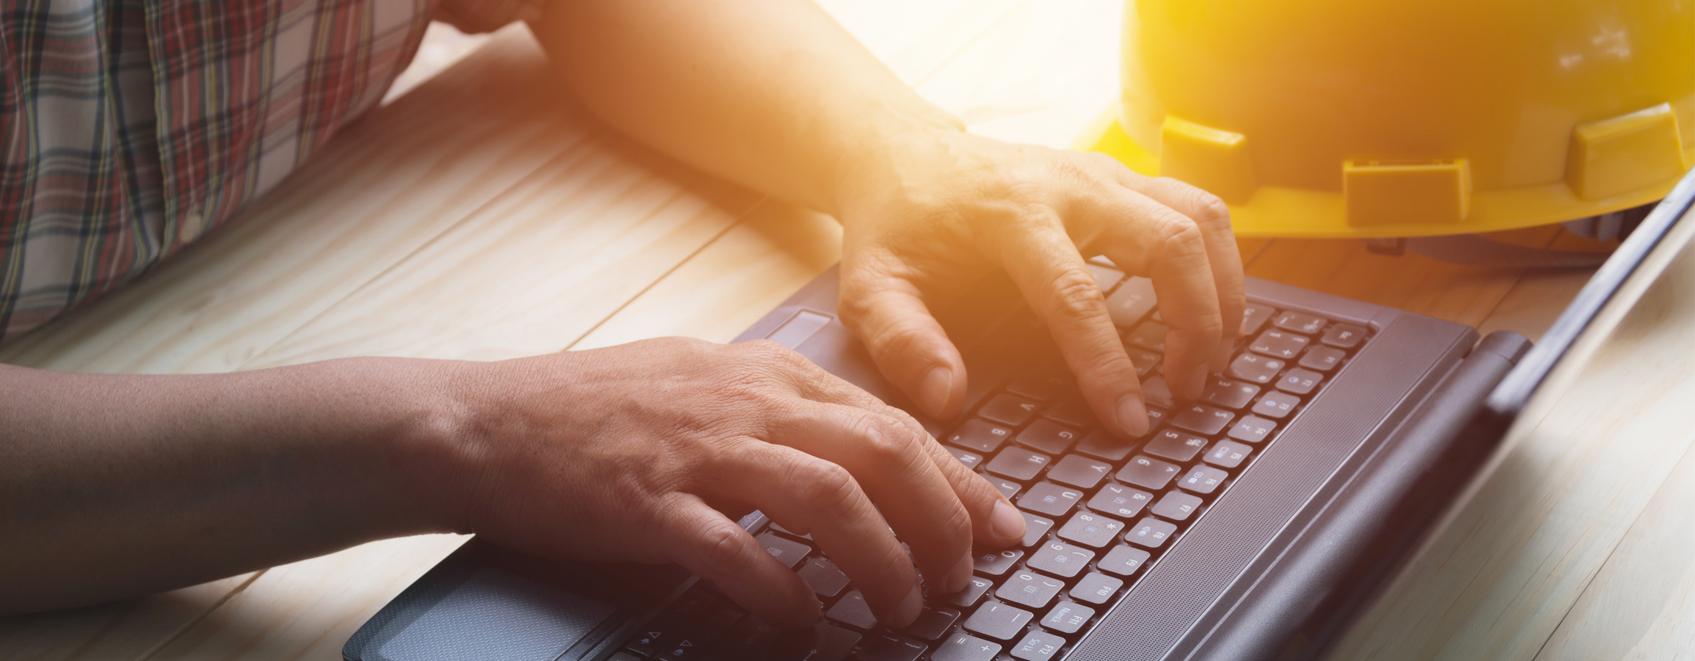 closeup of hands on laptop keyboard